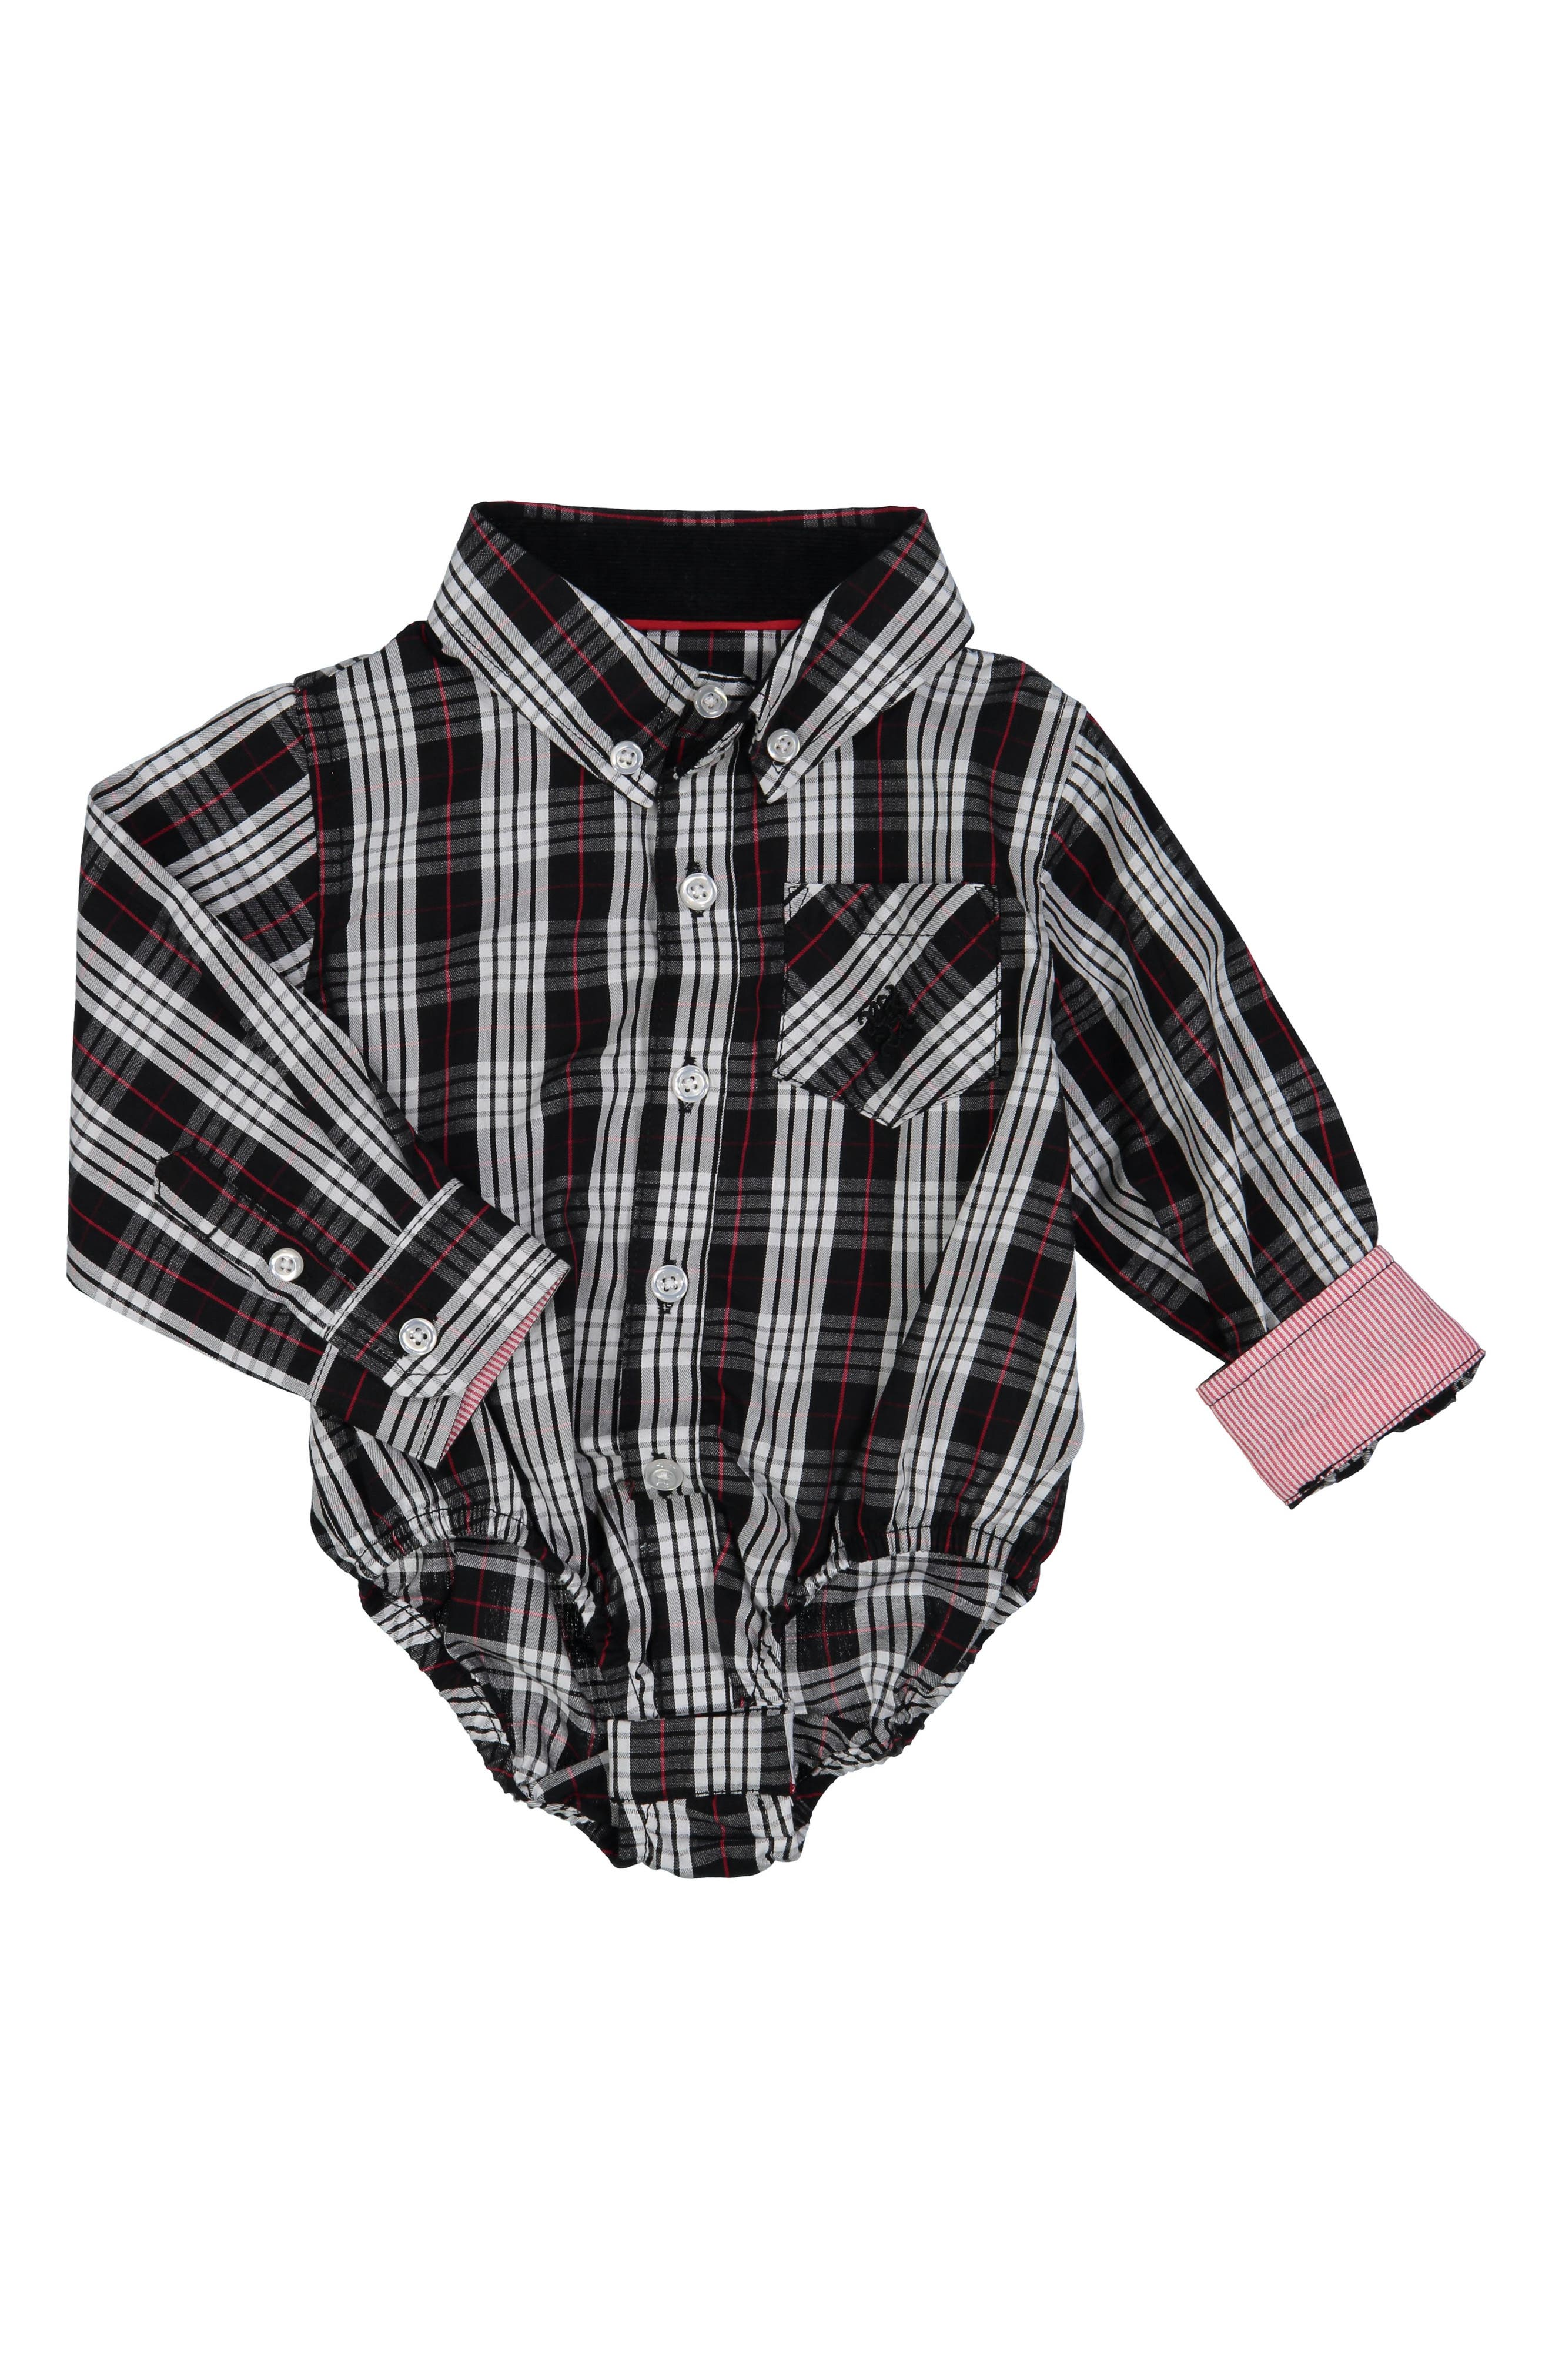 Shirtzie Holiday Check Bodysuit,                         Main,                         color, 002